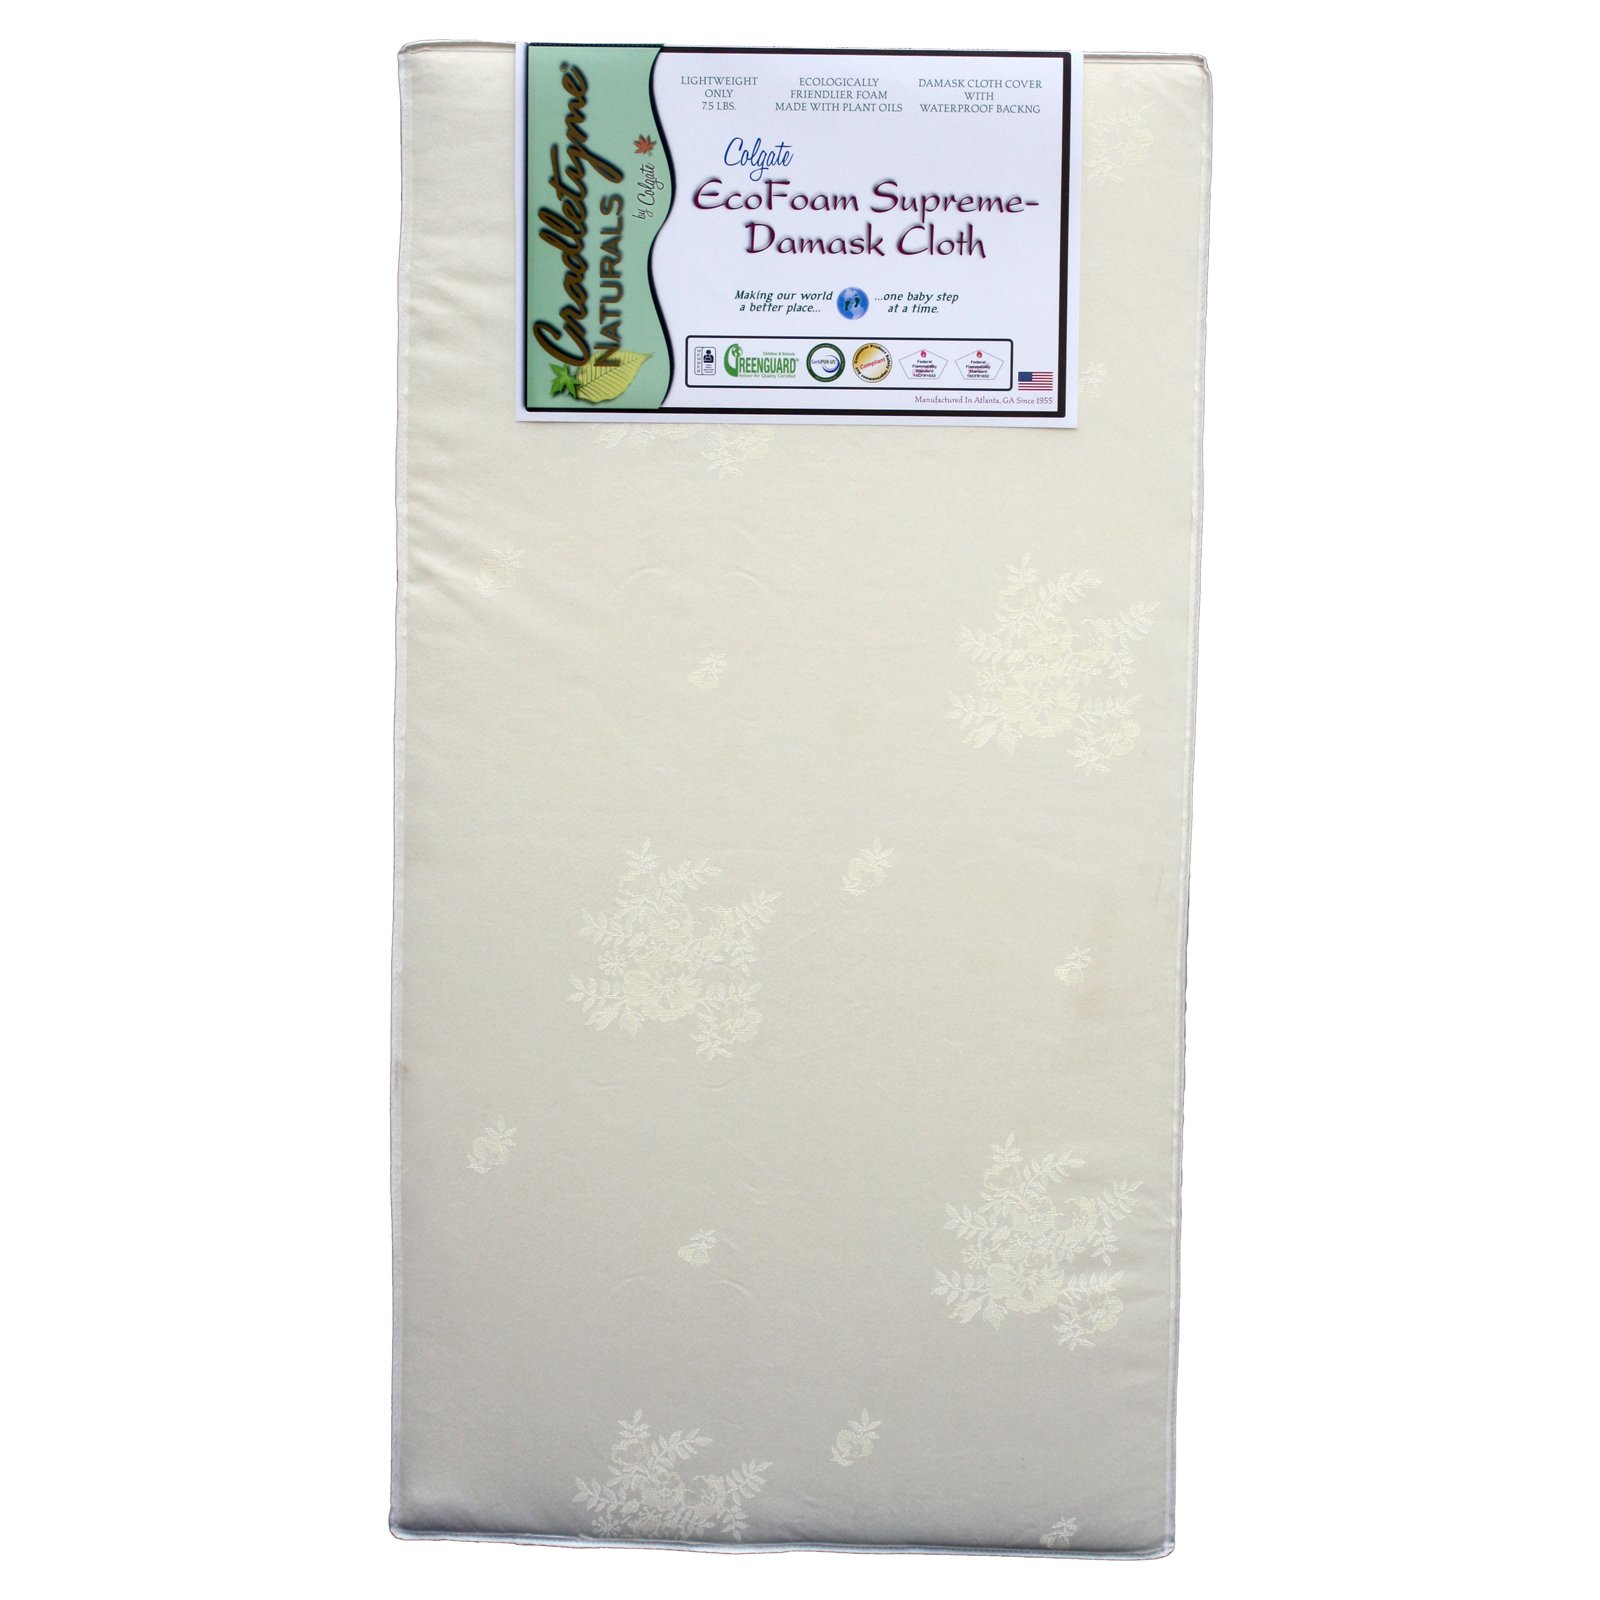 Colgate EcoFoam Supreme Damask Cloth Crib Mattress